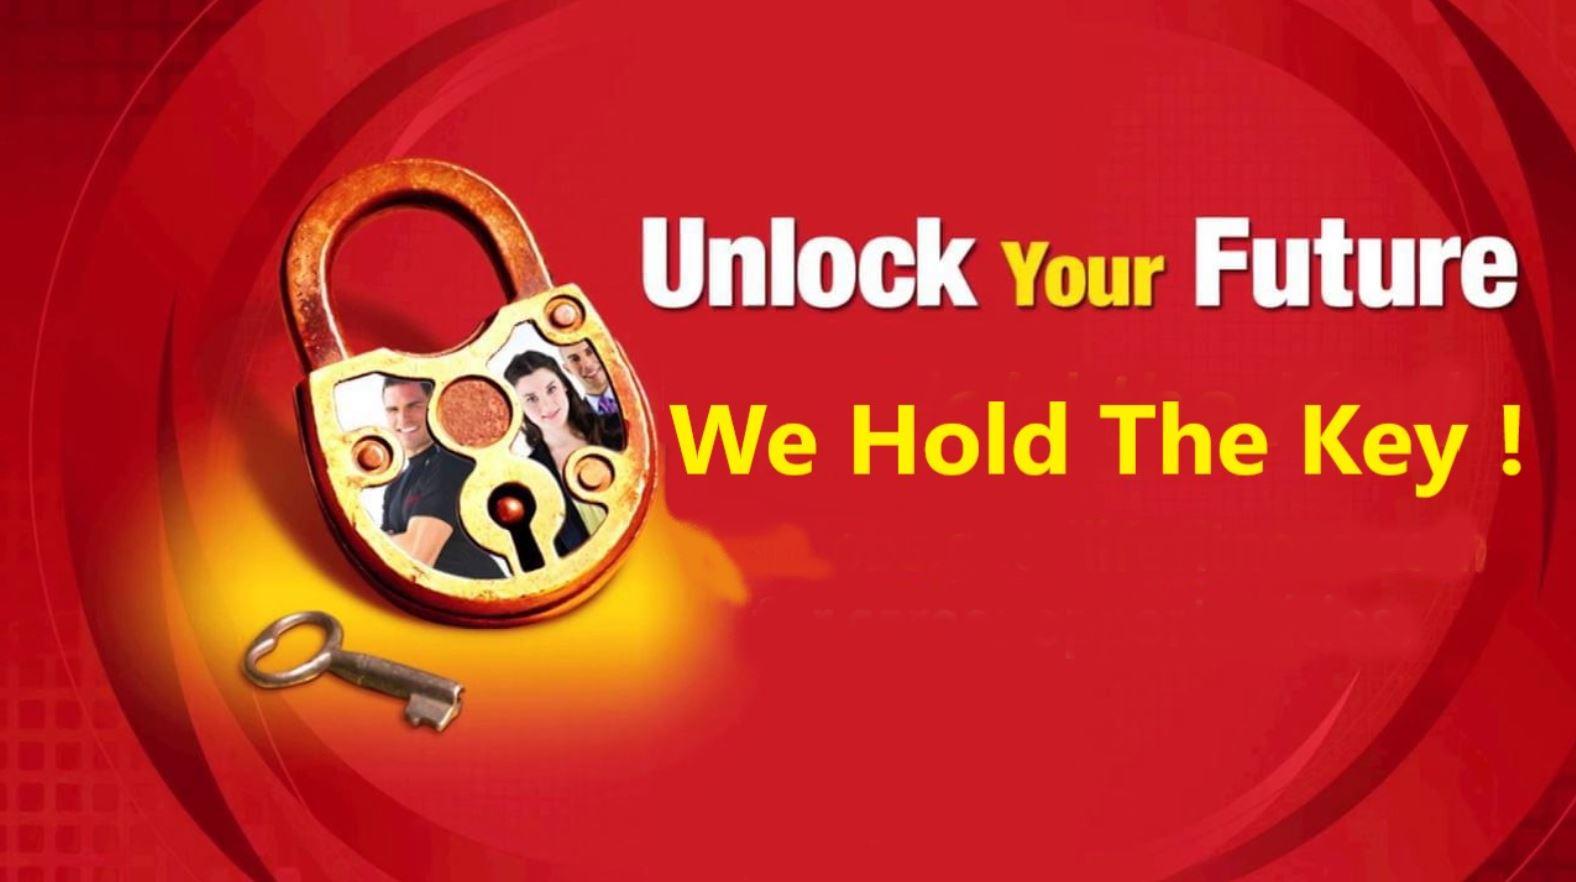 8 unlock yr future we hold the key.JPG